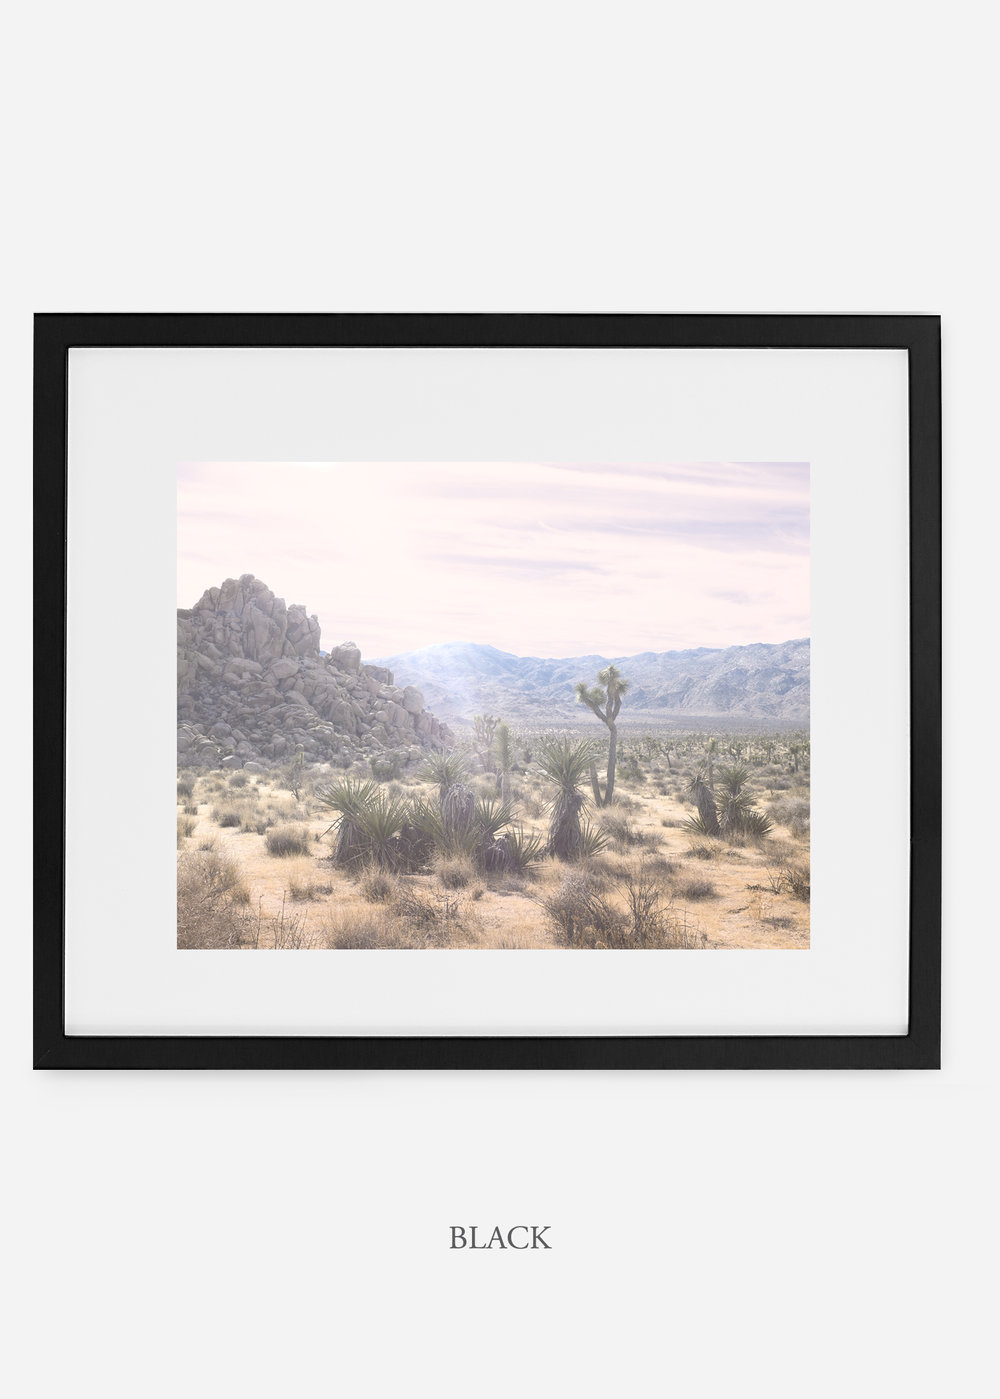 WilderCalifornia_blackframe_JoshuaTree_No.9_interiordesign_prints_art.jpg